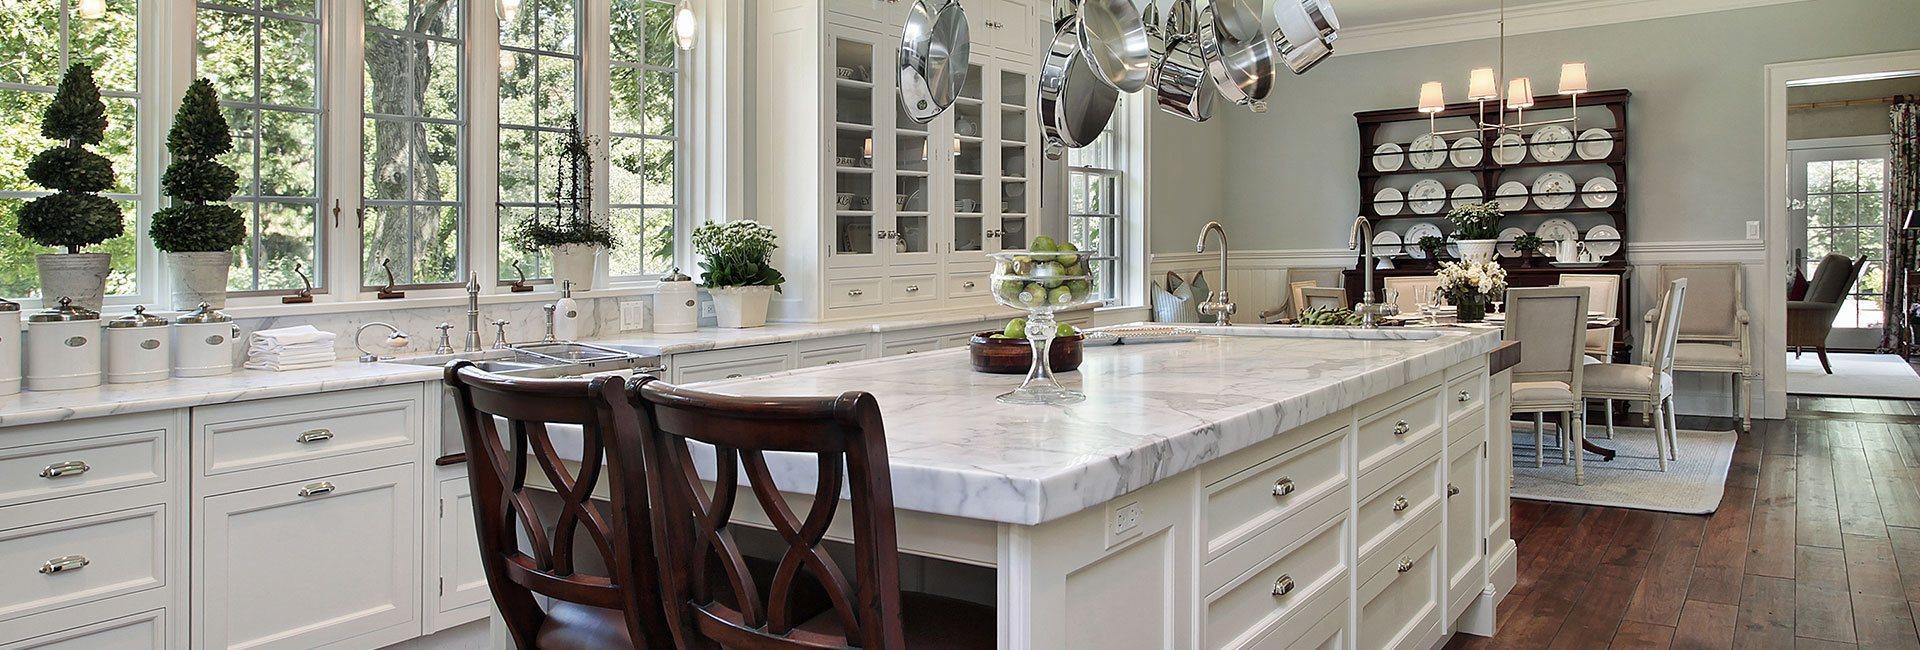 mbcremodeling kitchen remodel contractors Consistent Communication